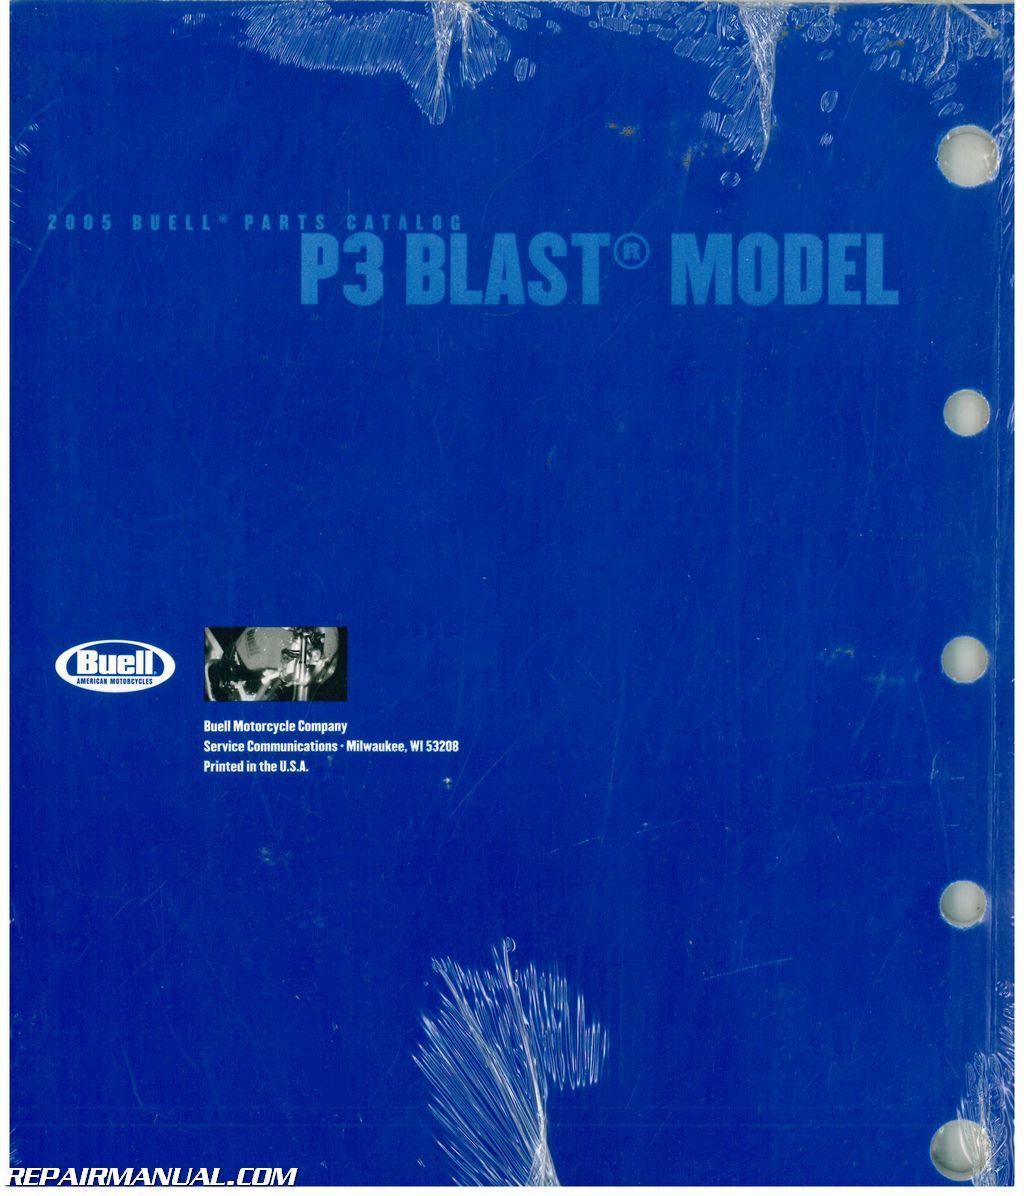 blastn local manual